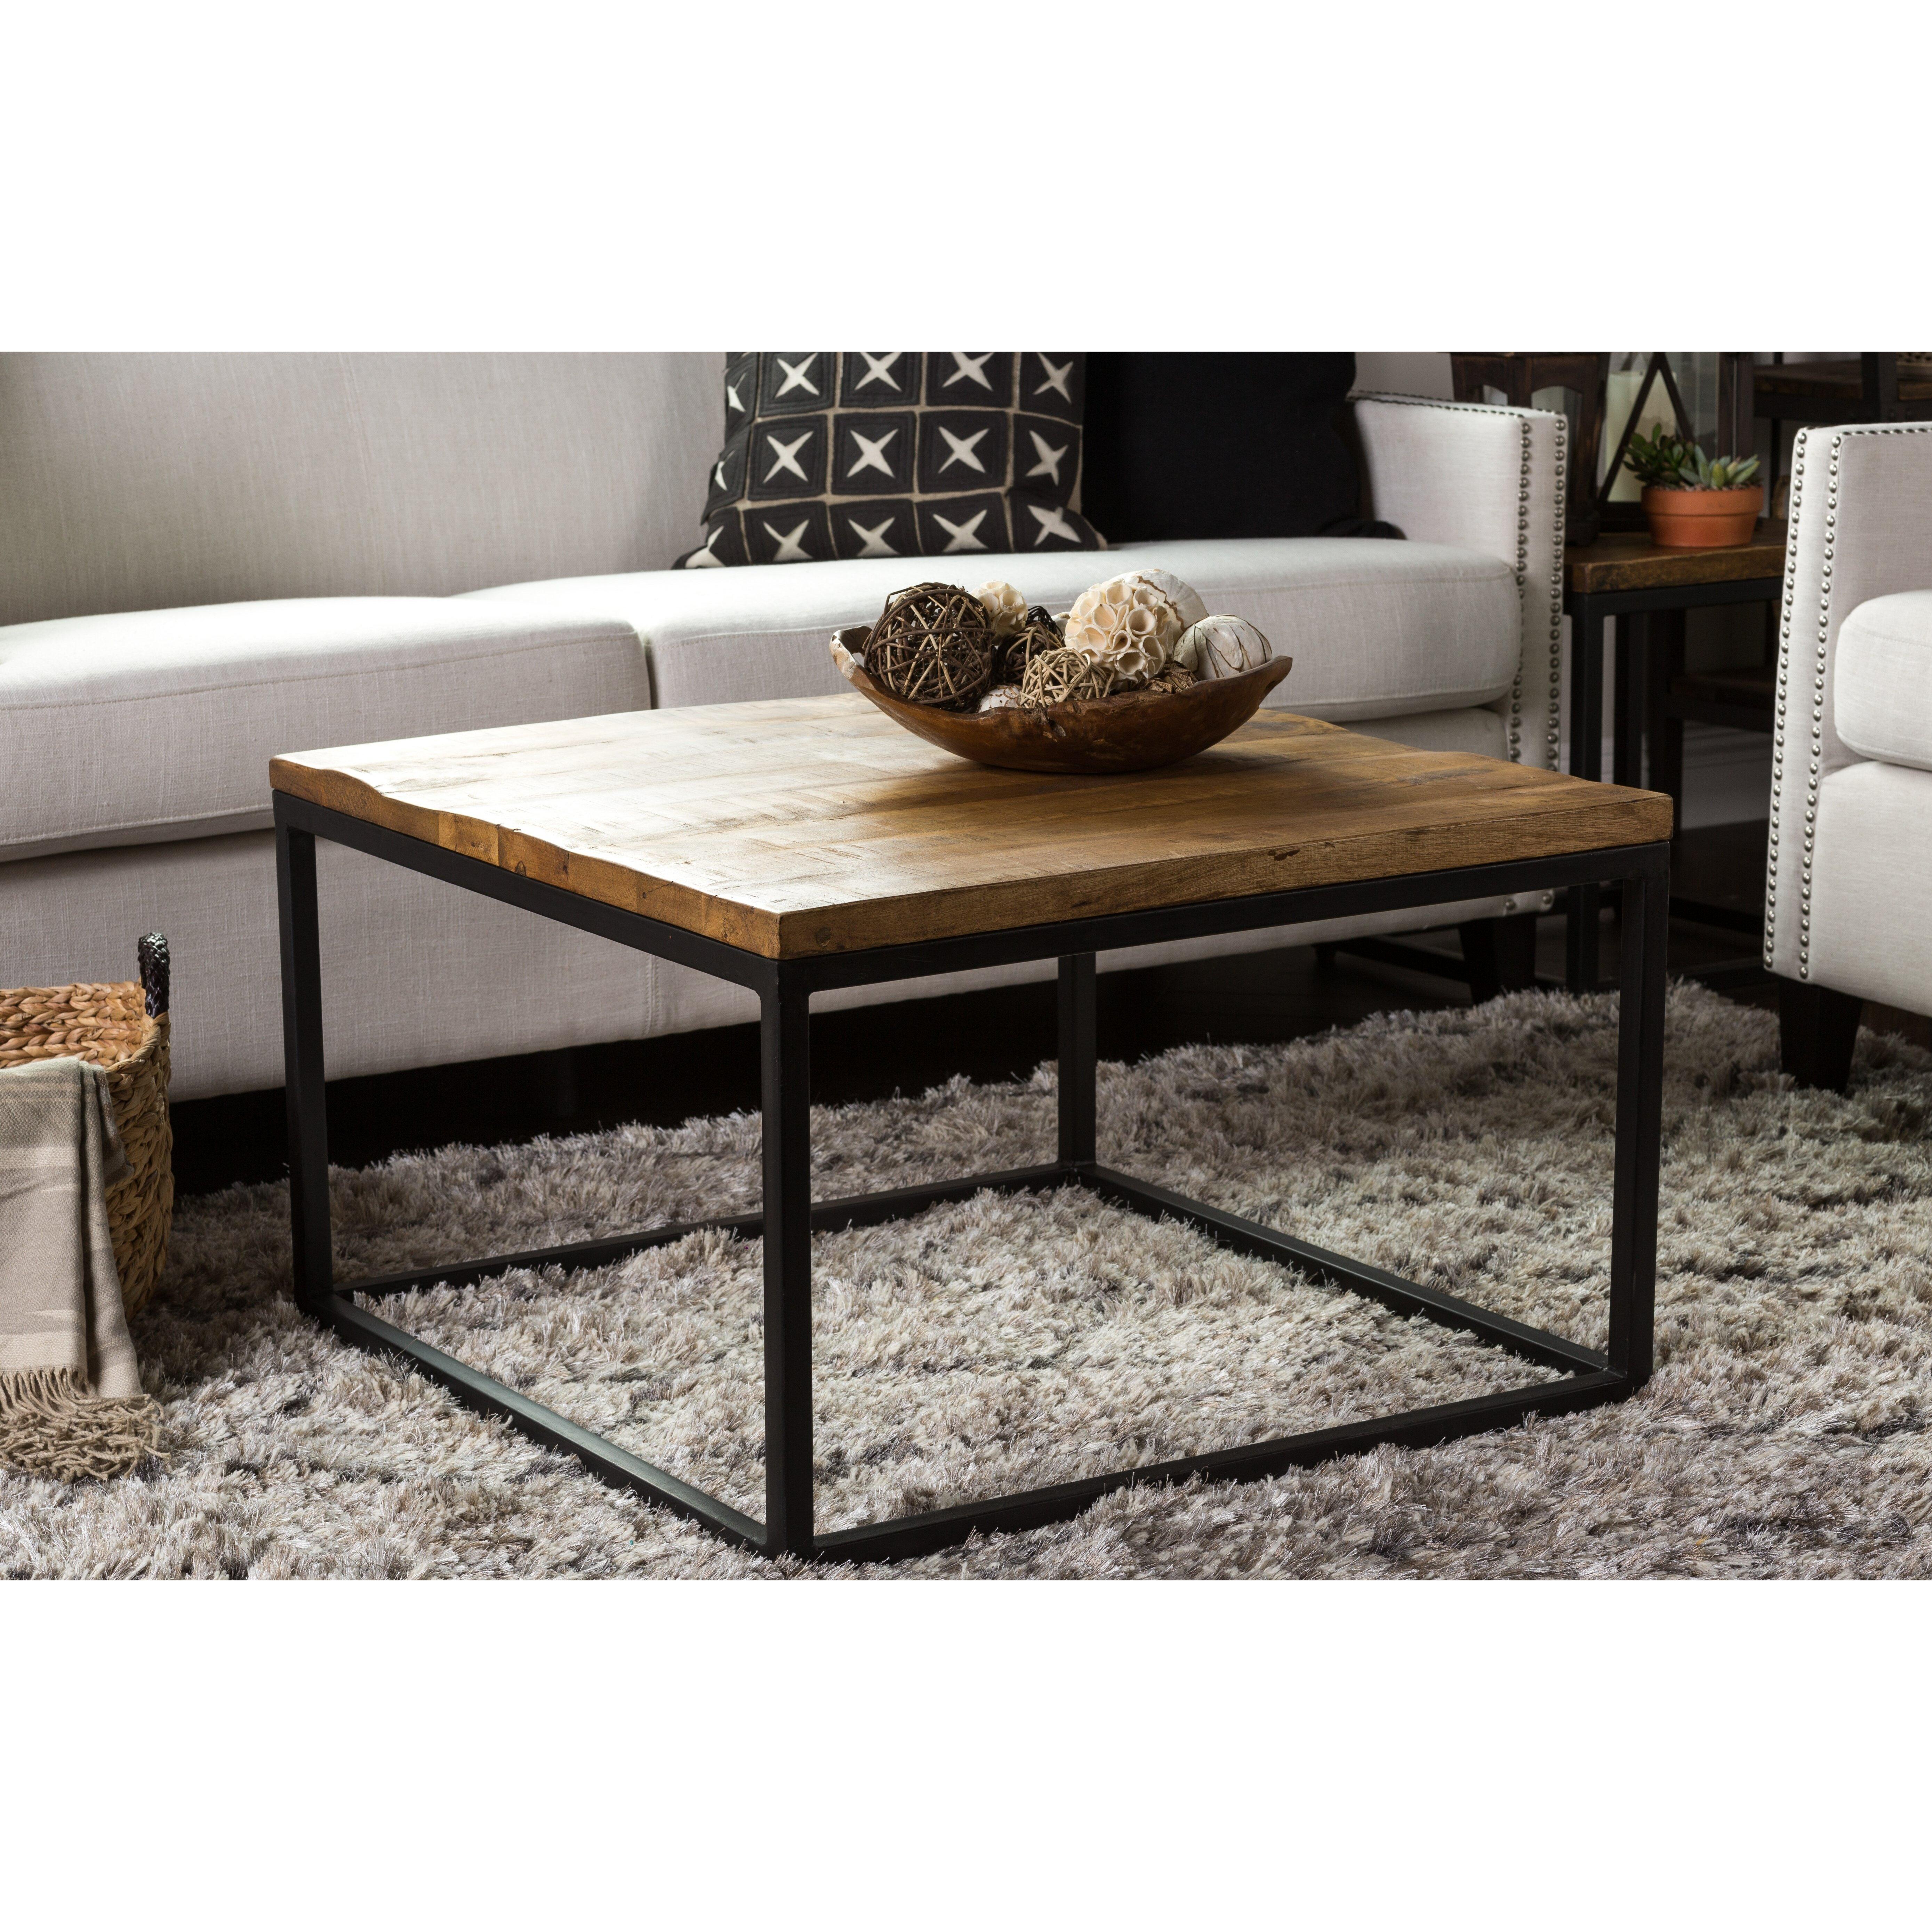 Trent Austin Design Laguna Coffee Table Reviews: Trent Austin Design Claremore Coffee Table